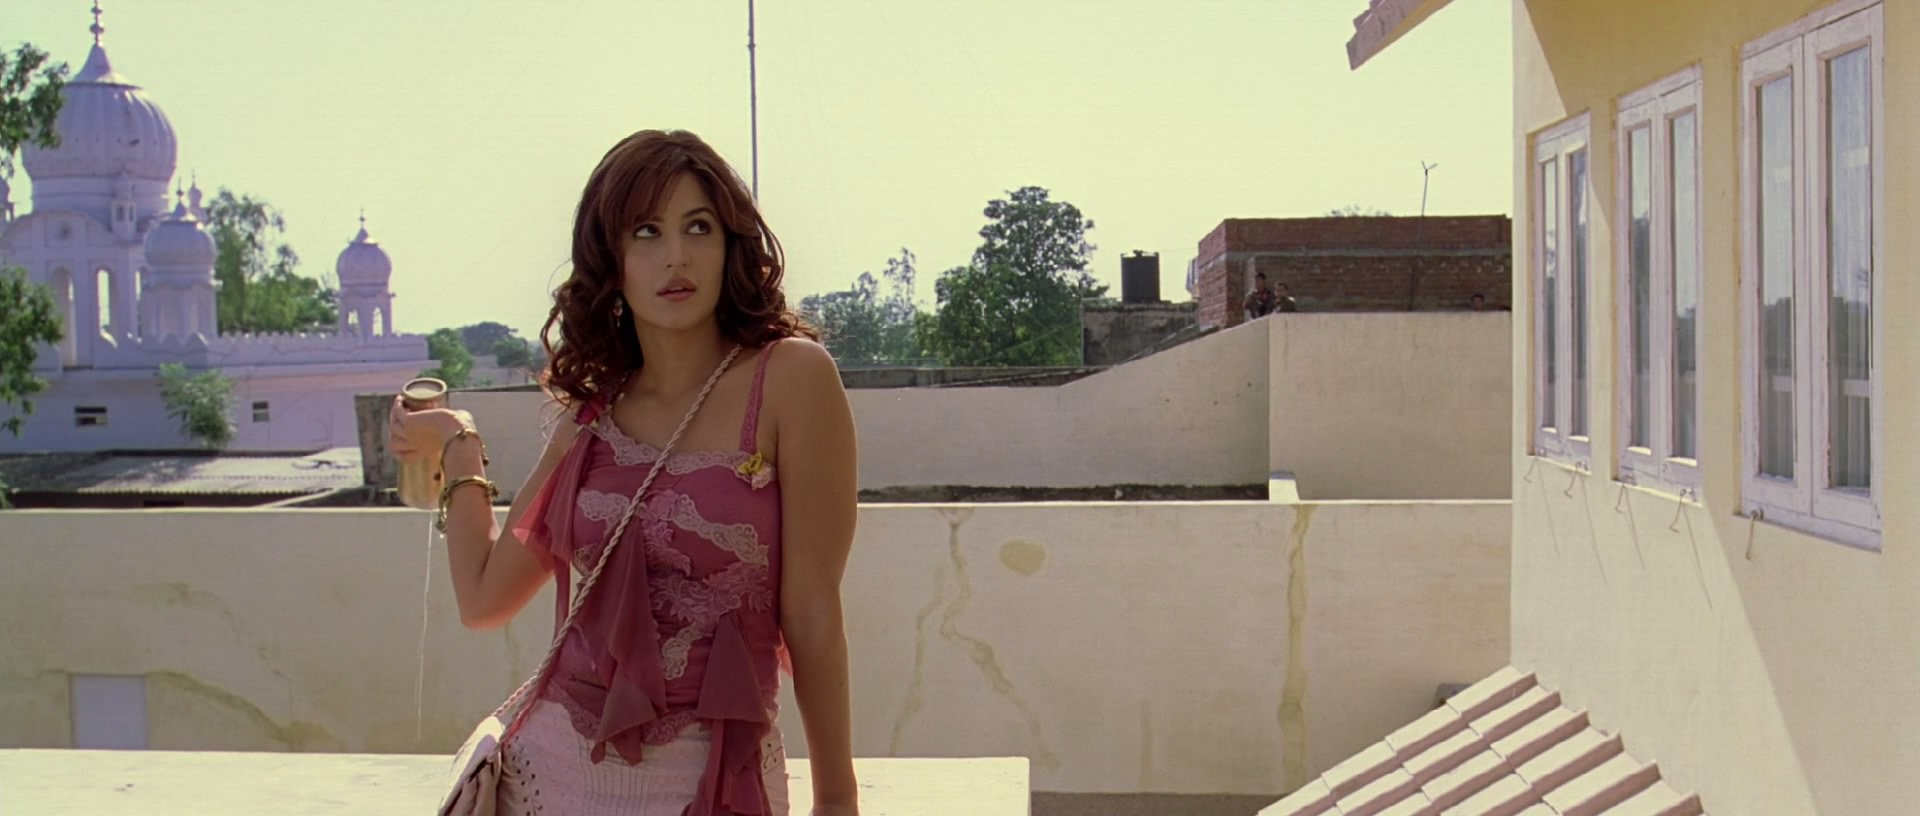 Намасте, лондон (2007) - IMDb